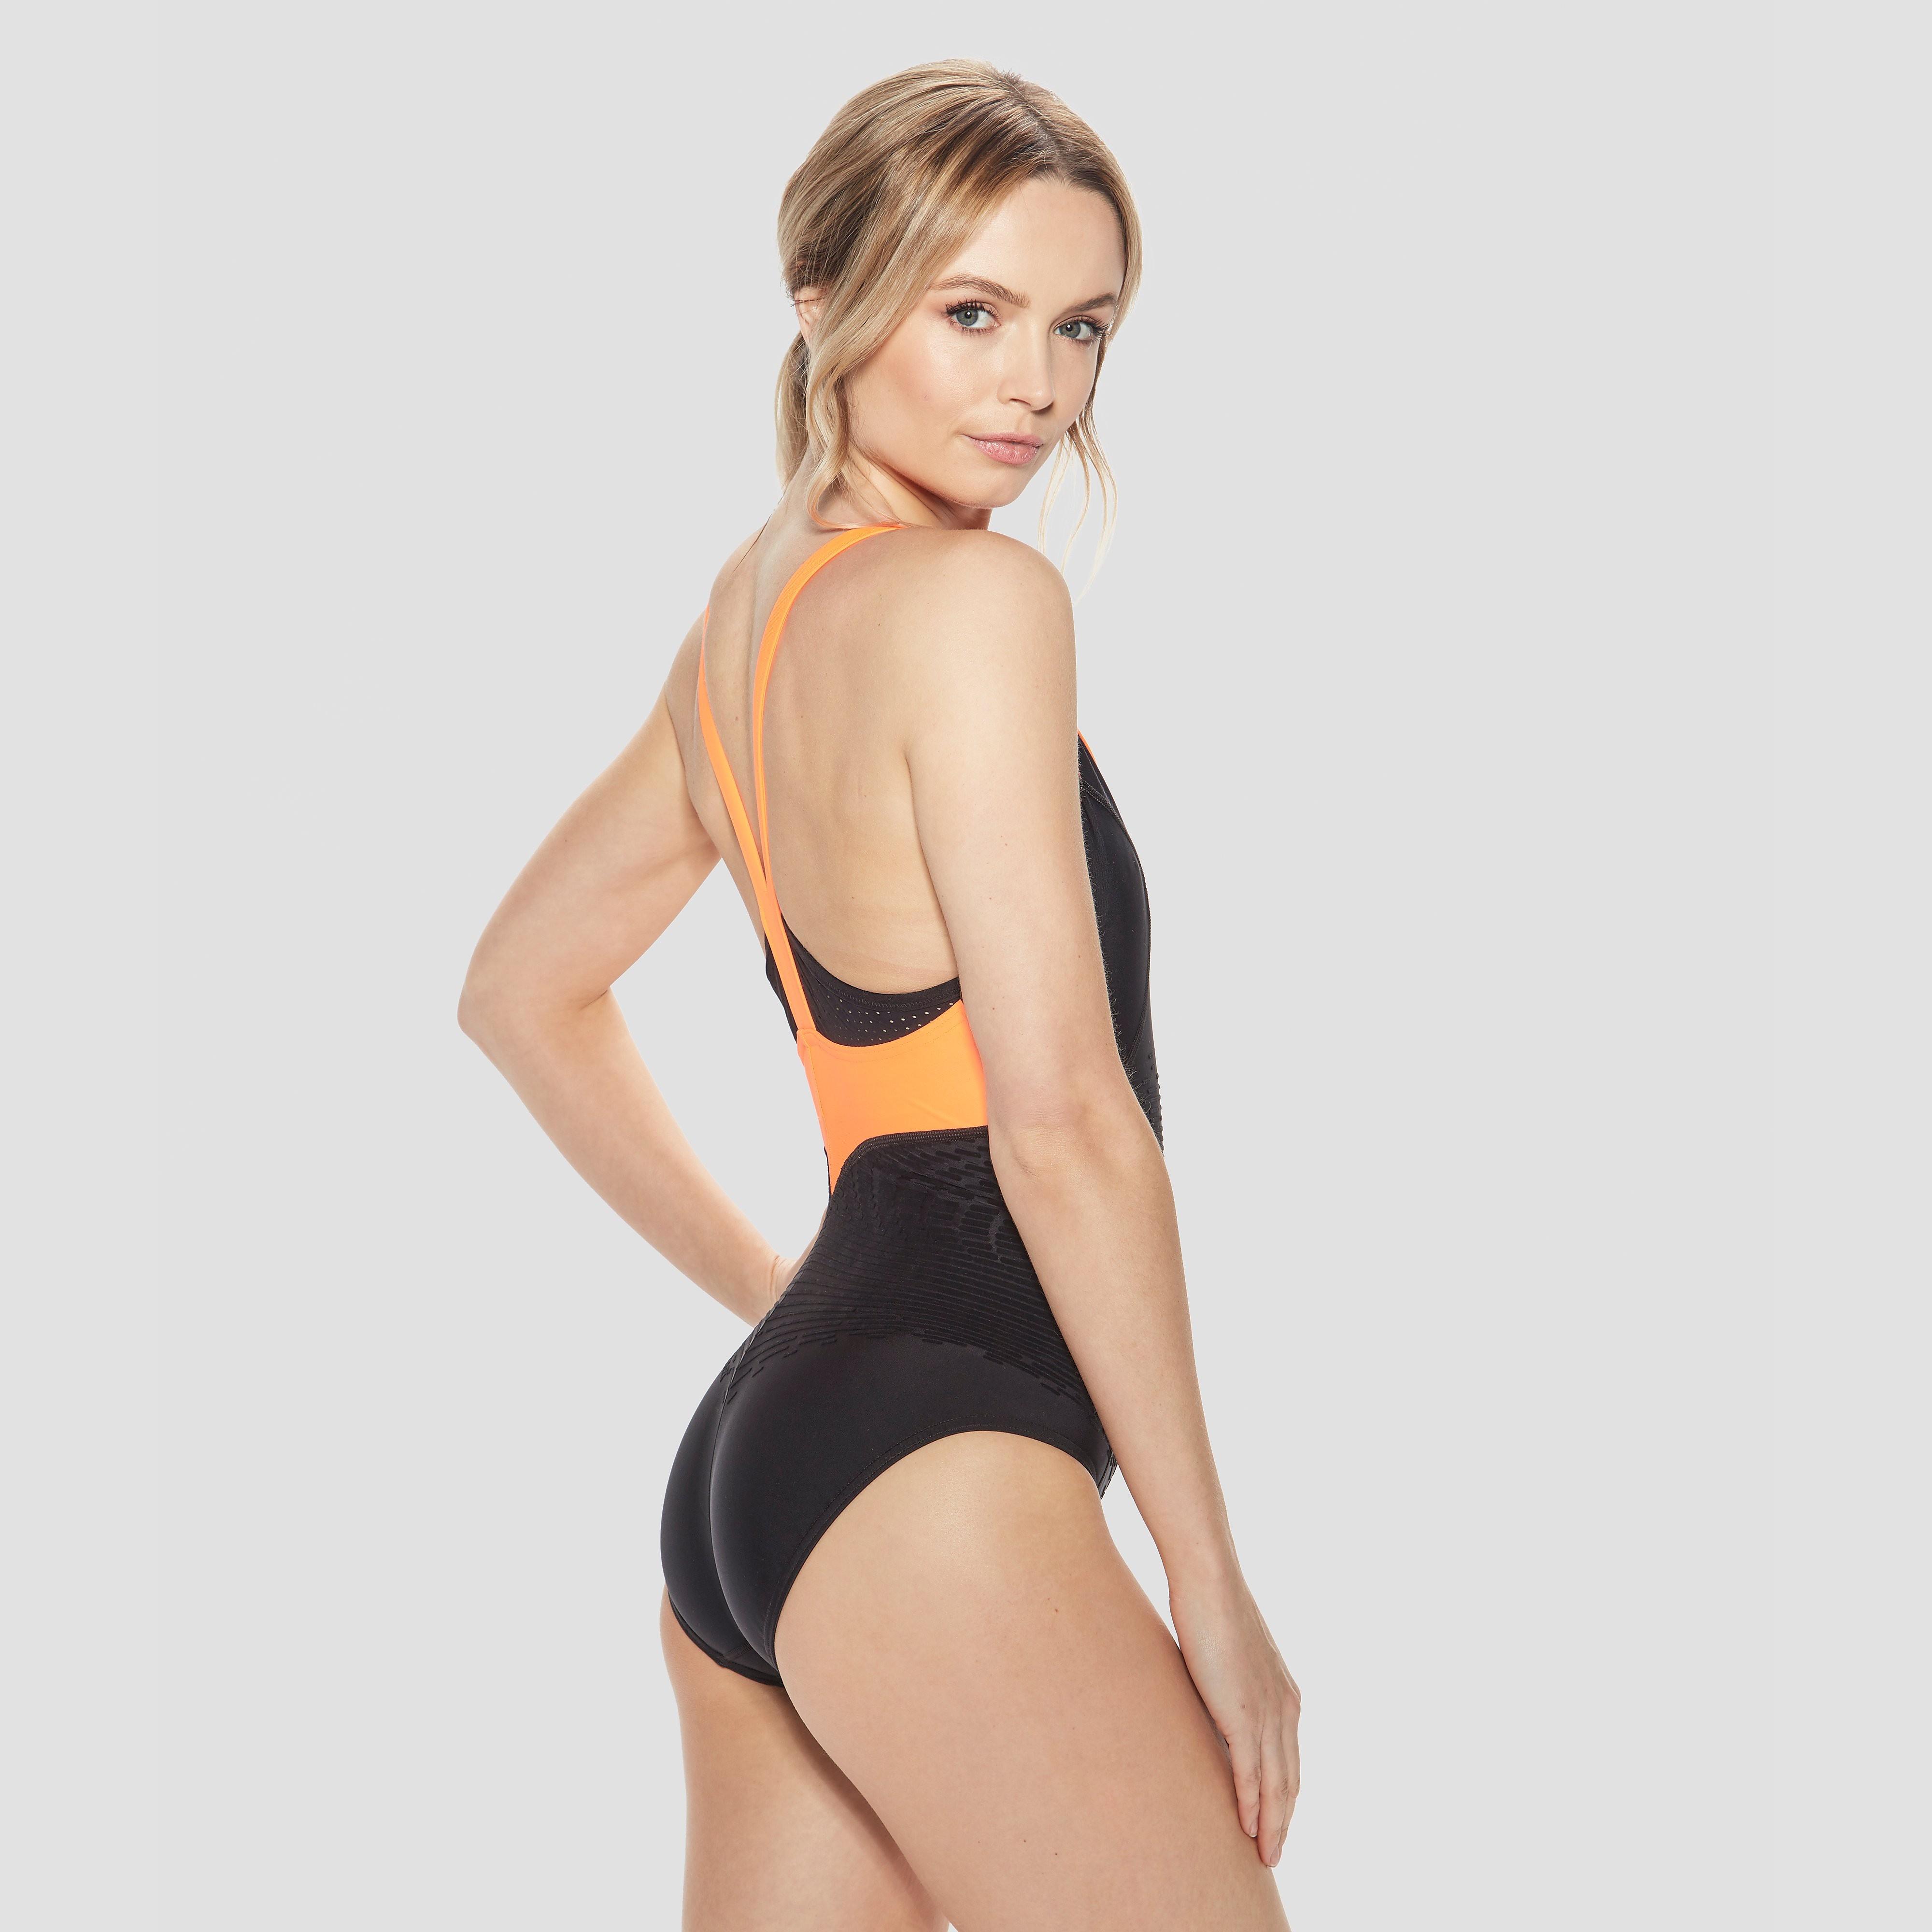 Speedo Fit Powerform Women's Pro Swimsuit